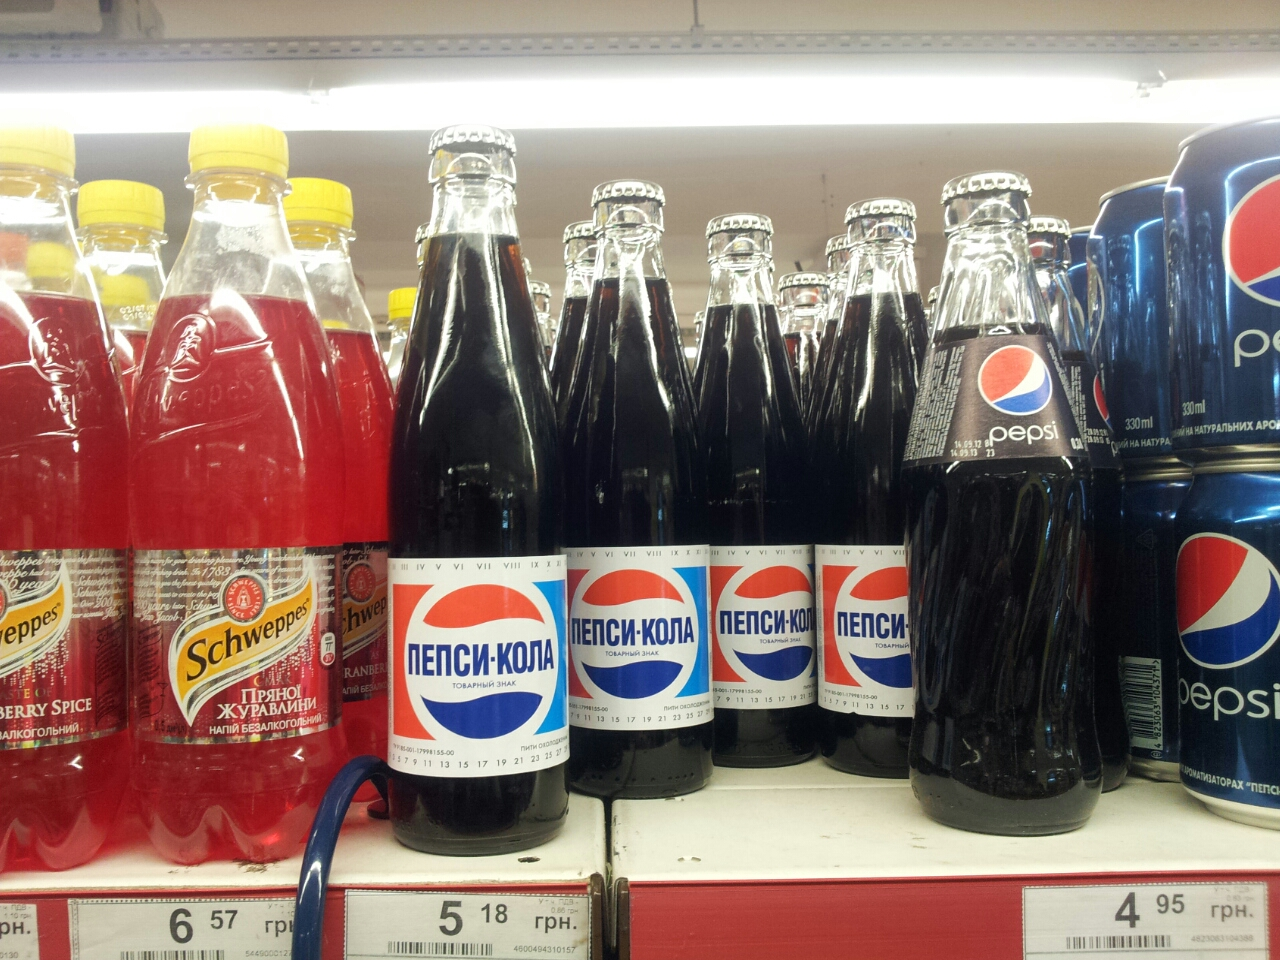 Classic_Pepsi_bottles_in_Russian Market